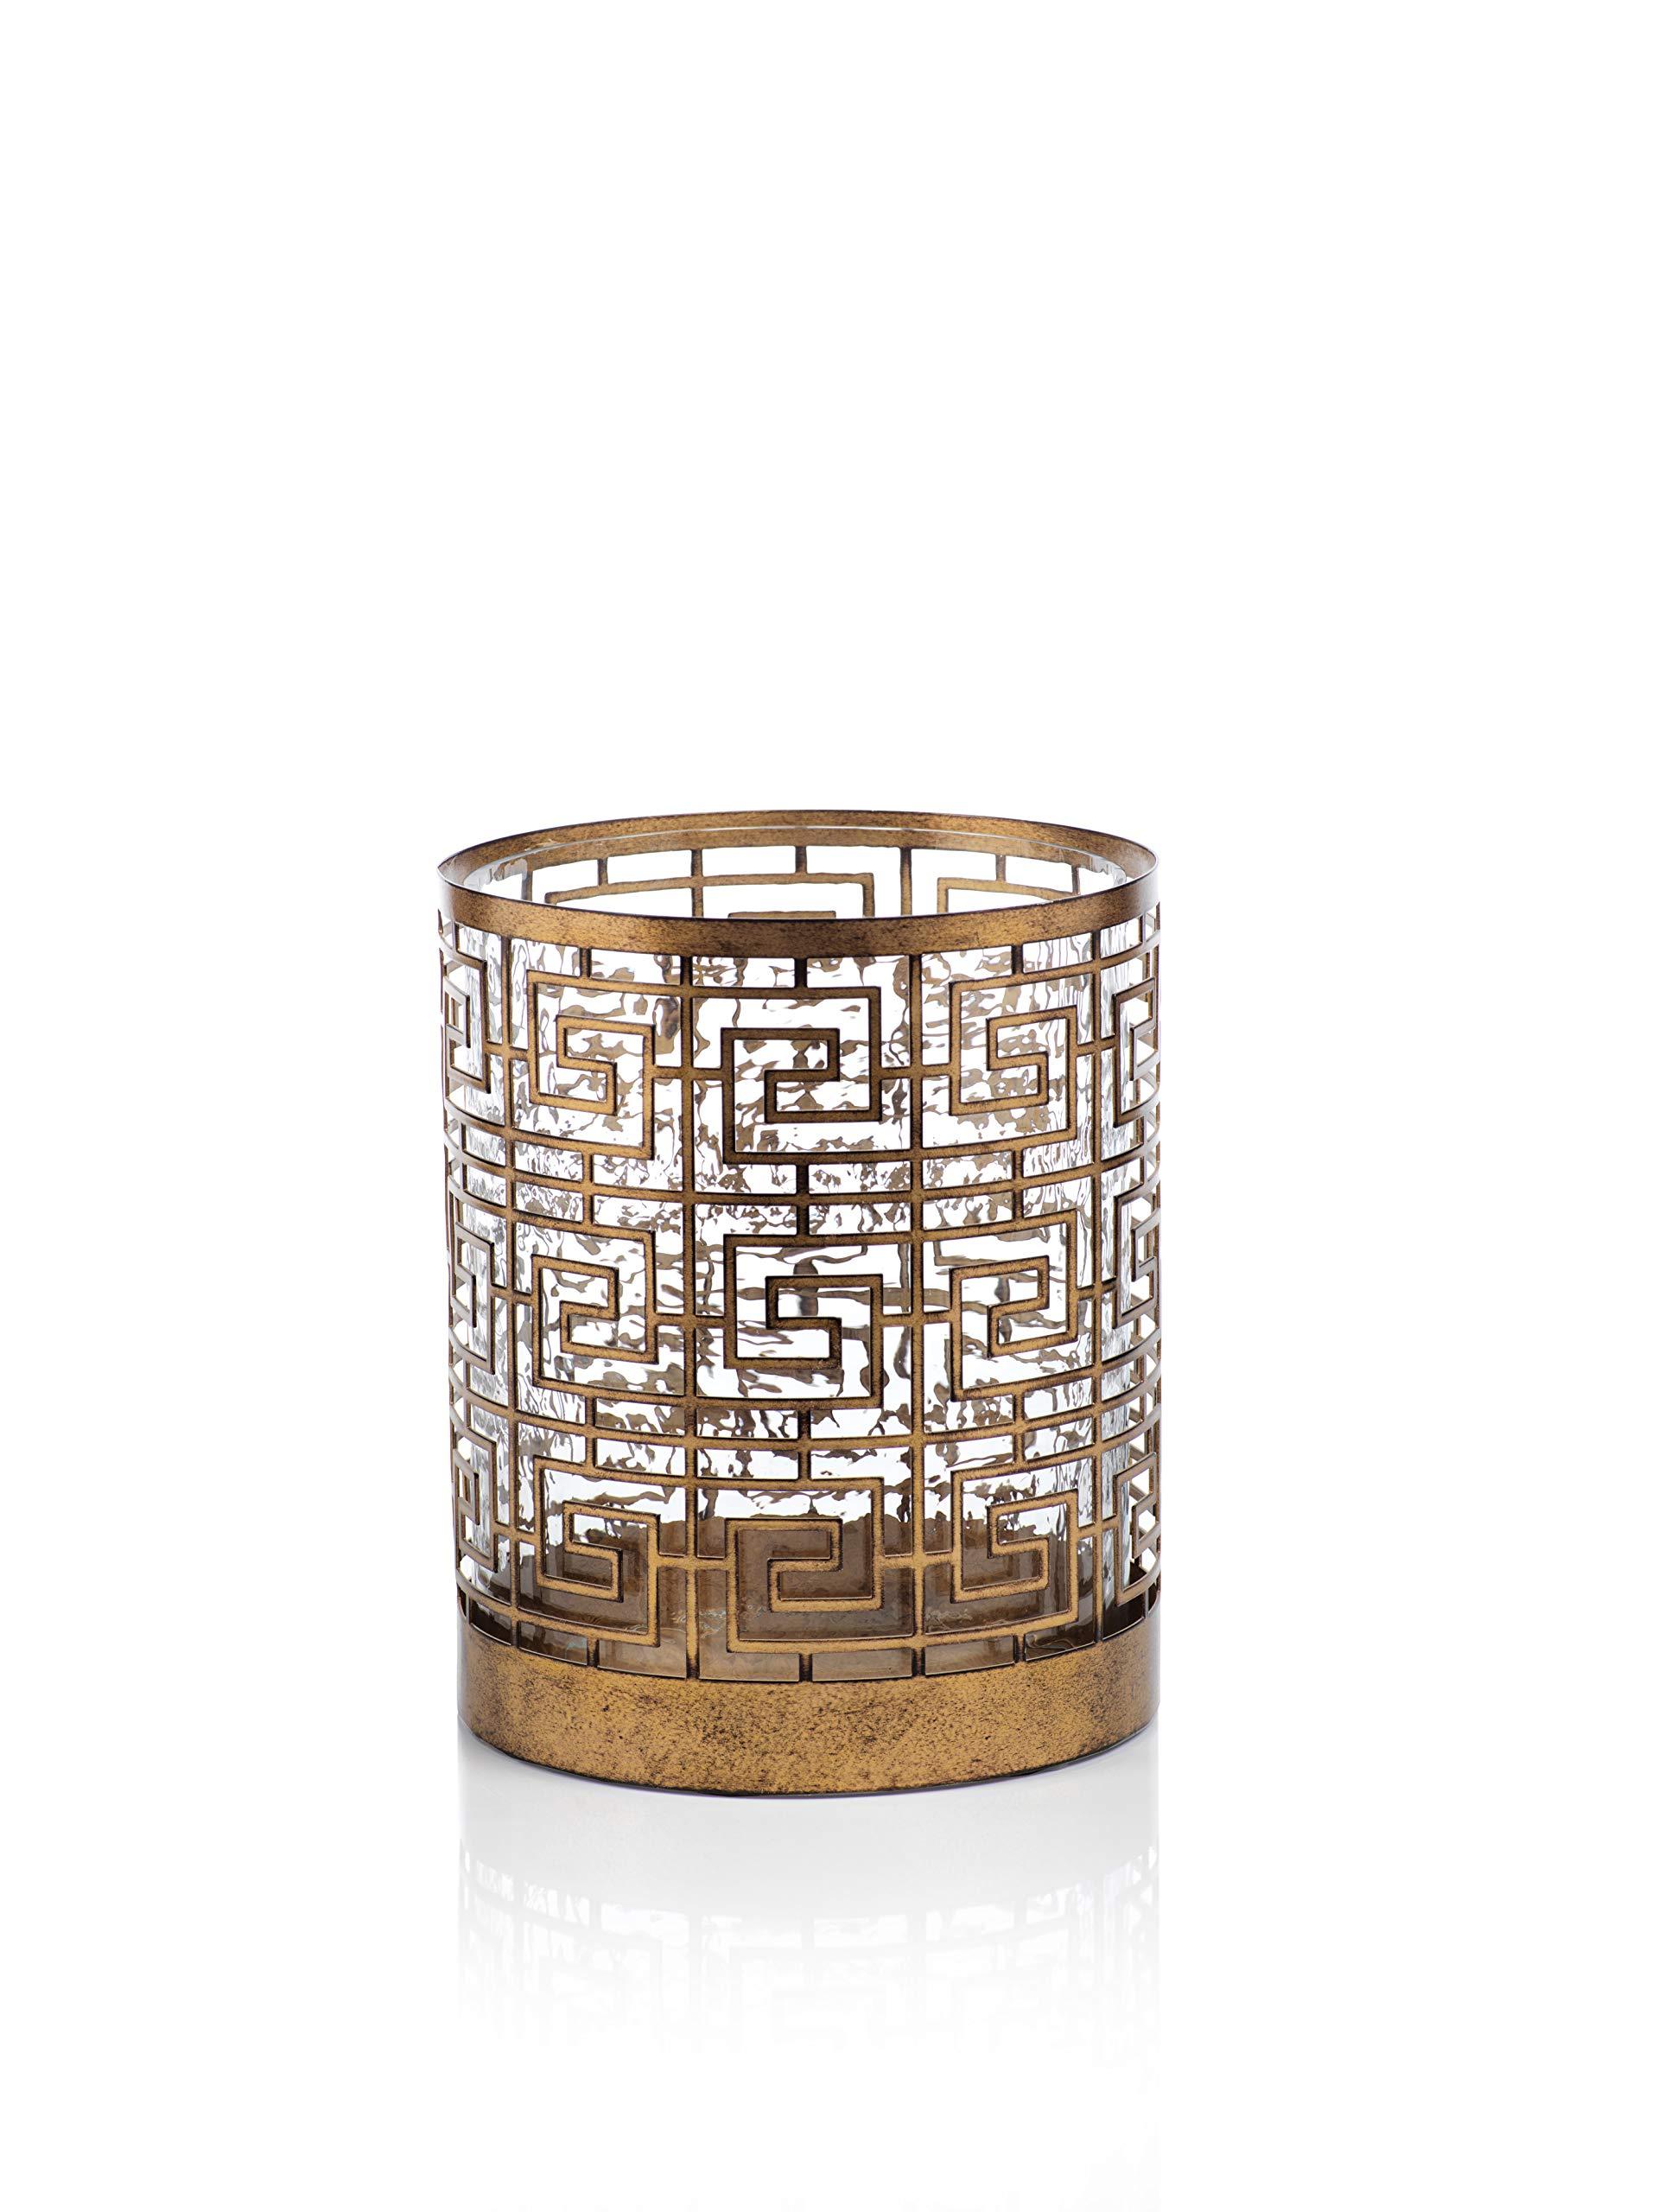 Zodax Mondre 8.5'' Diameter Metal Candle Holder Hurricane, Wide, Bronze